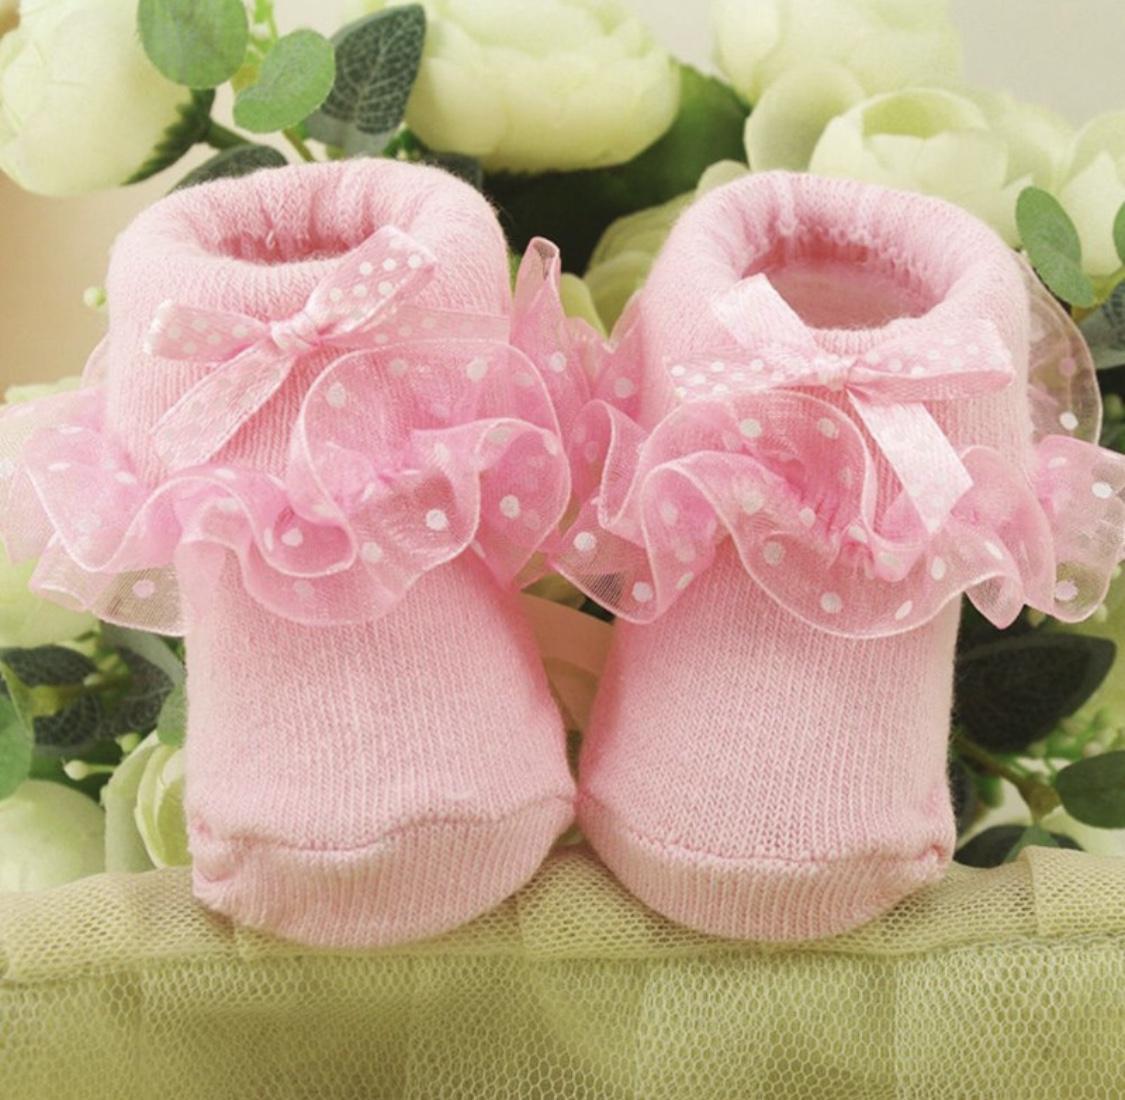 Jual Kaus Kaki Bayi Perempuan Terbaik Baby Girl Prewalker Shoes Fluffy Pink Ribbon Sepatu Lucu Imut Kaos Newborn Polkadot Renda Manis Dan Bigbabyshop